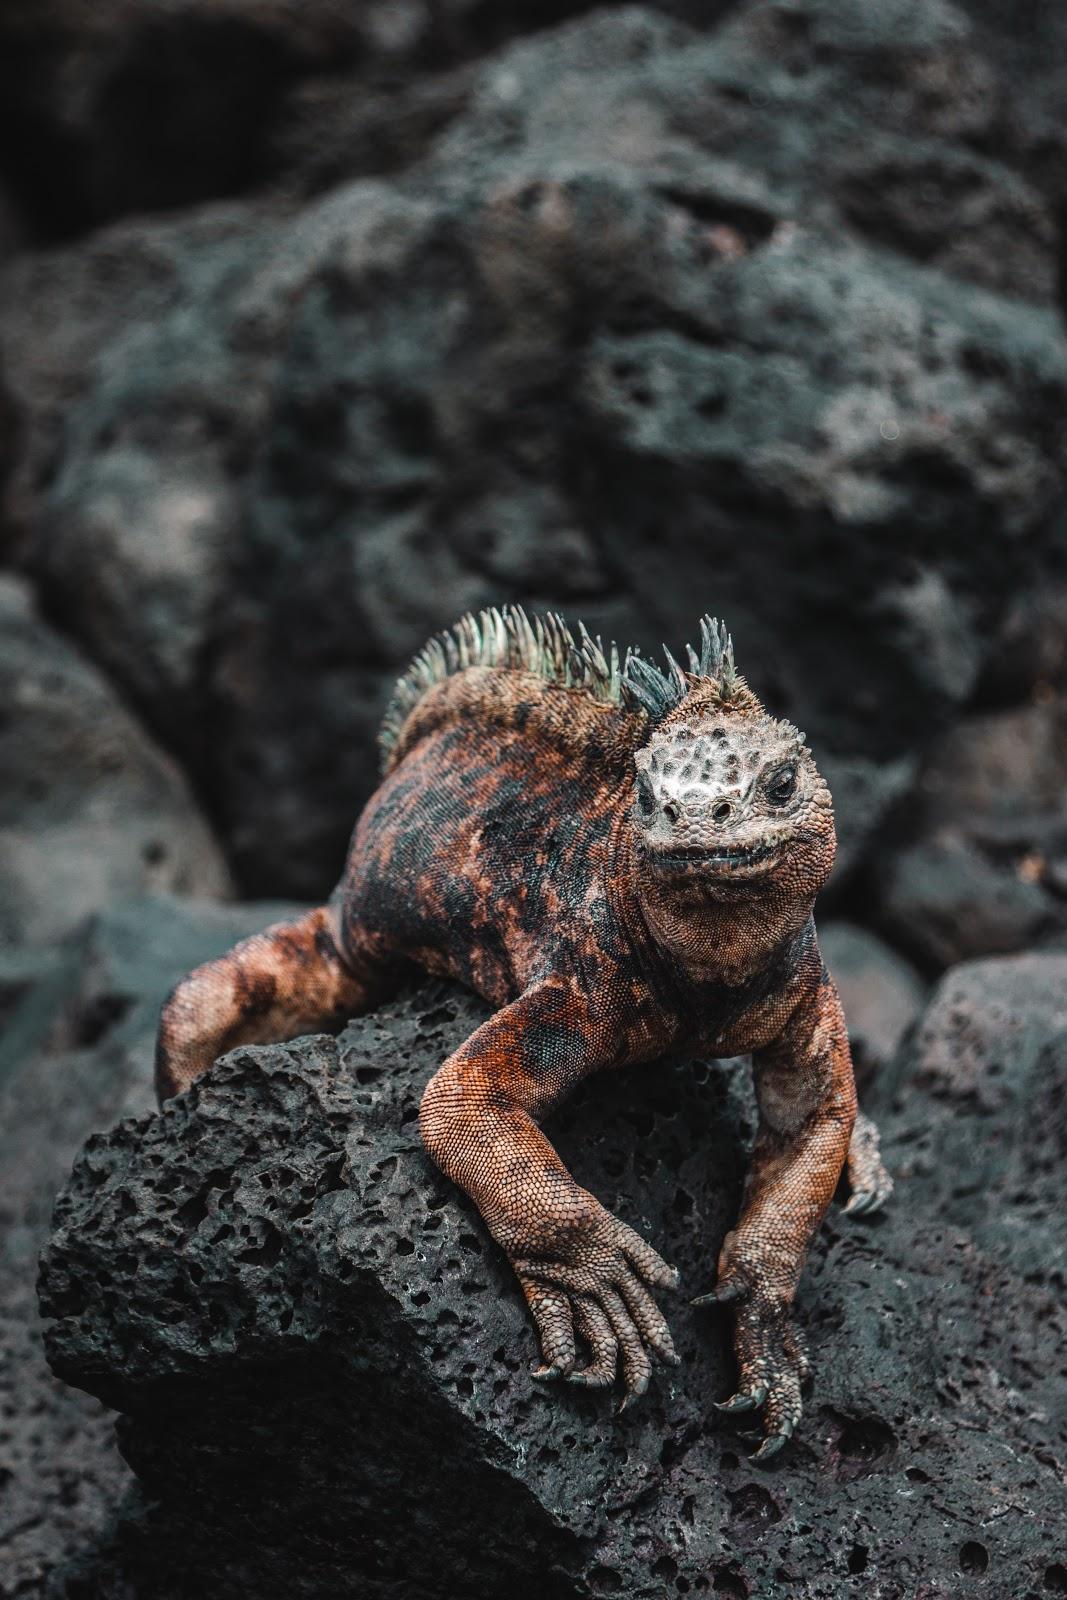 Iguana perched on black rocks